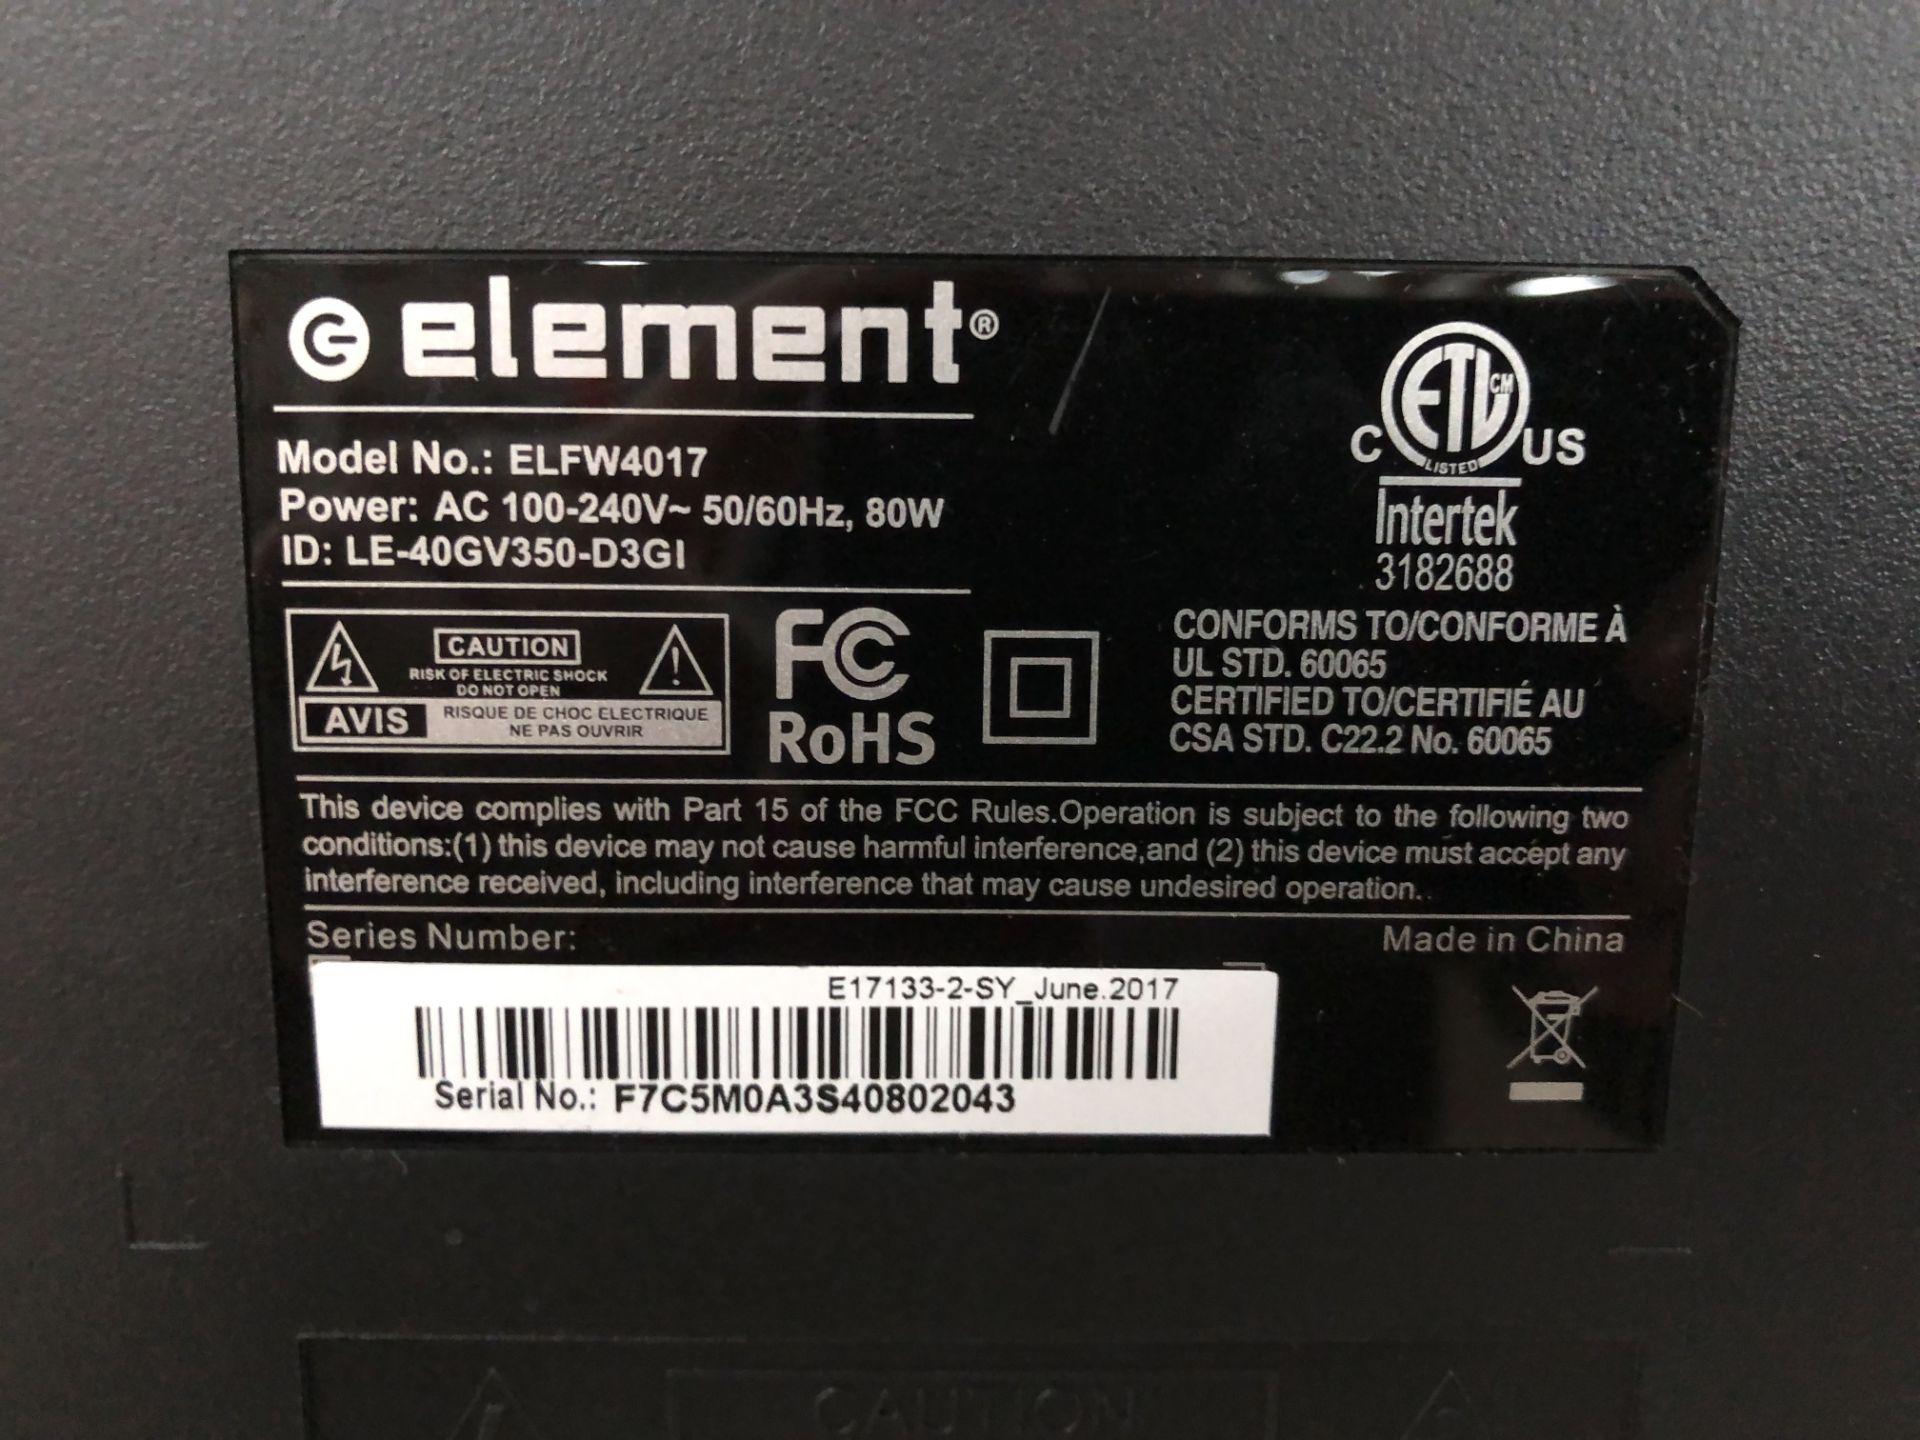 Lot 145E - Element TV, Model #ELFW4017